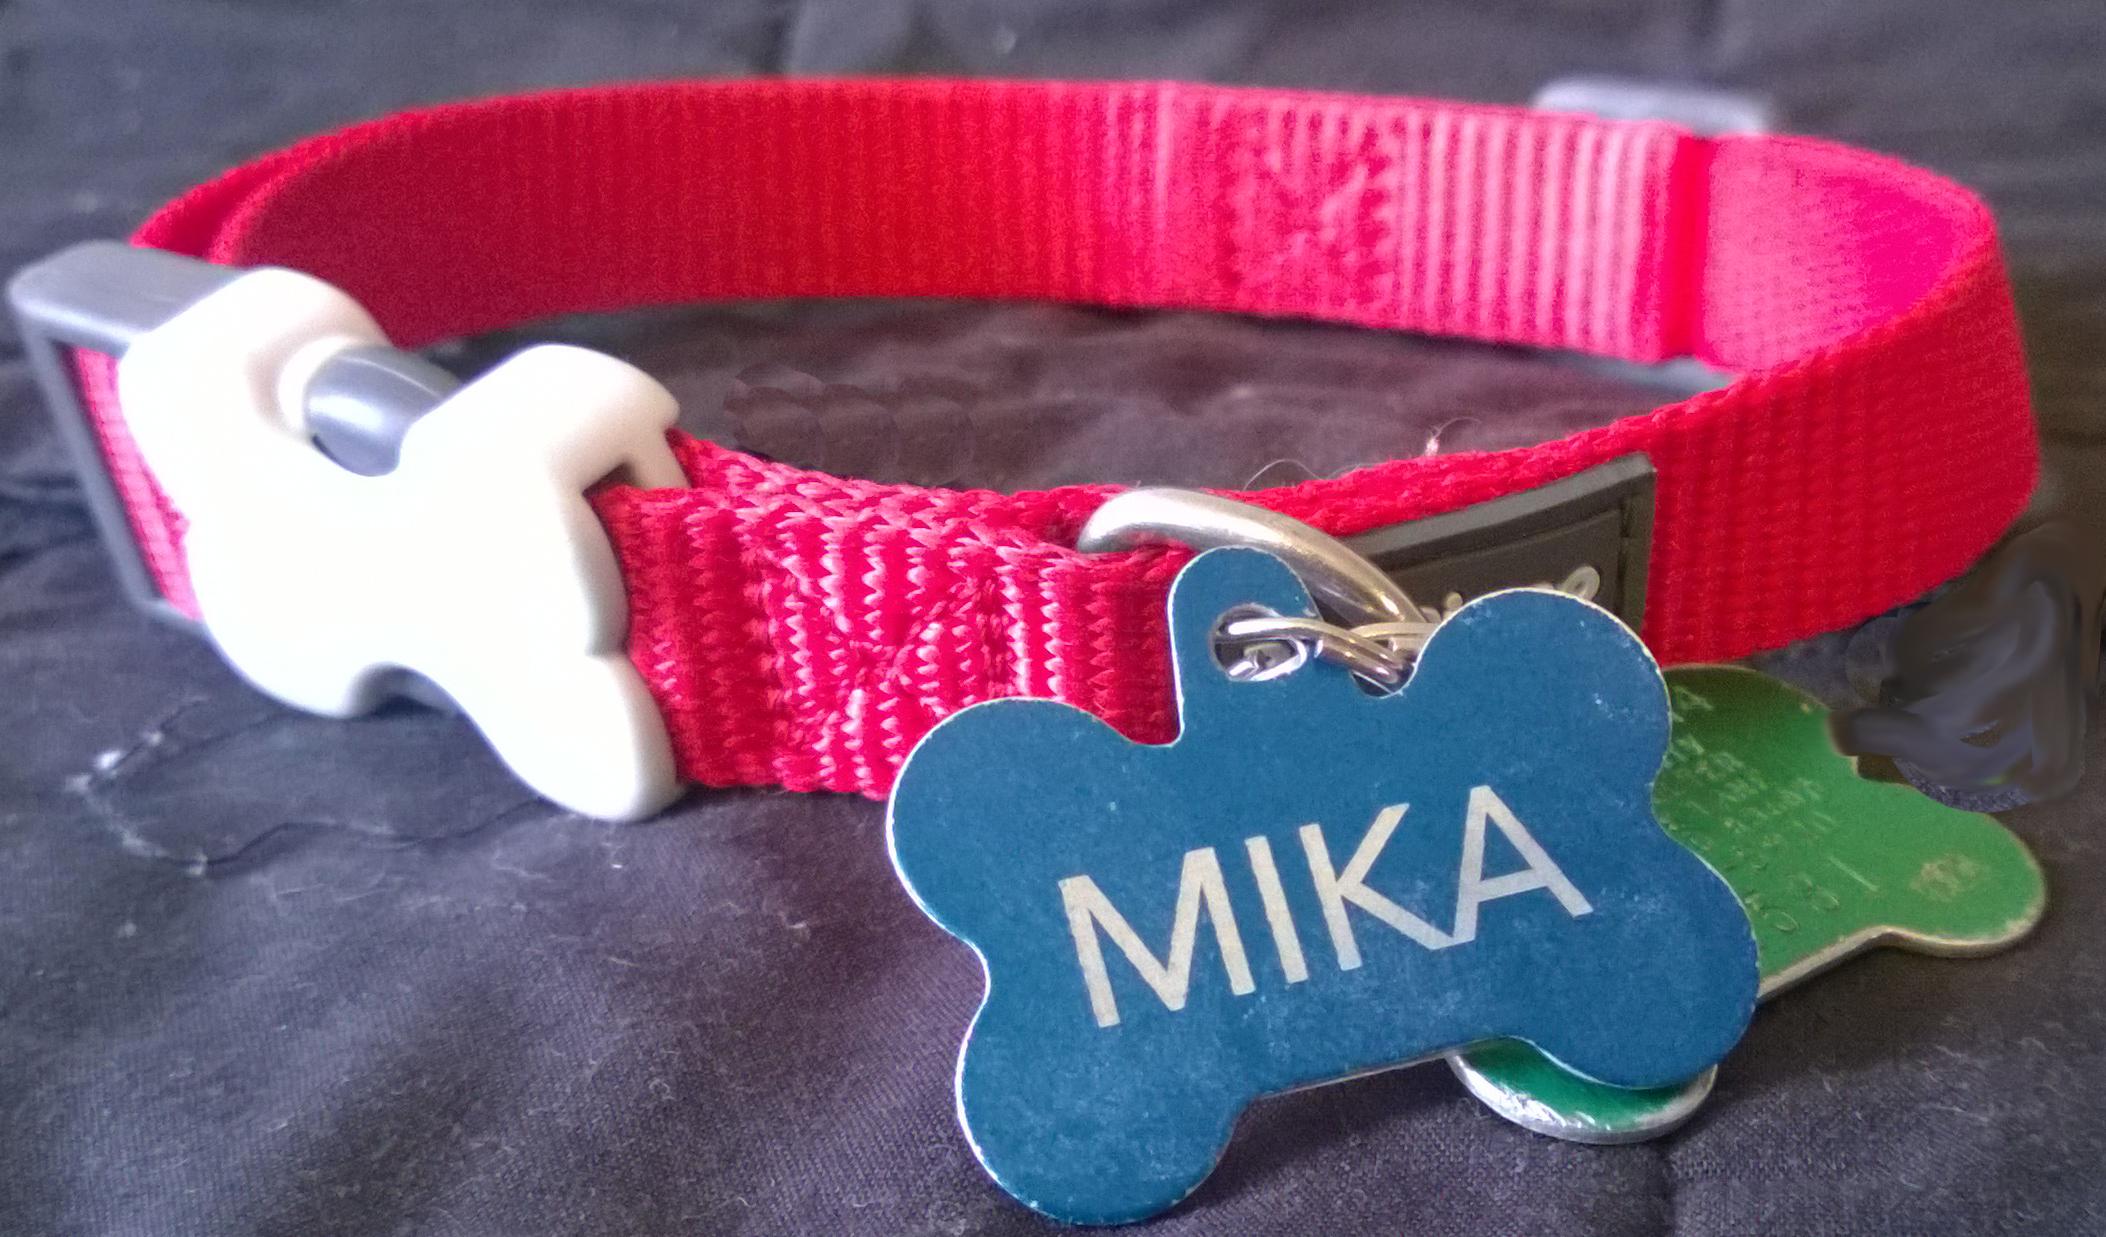 Clerical collar of Spiritual Director Mika